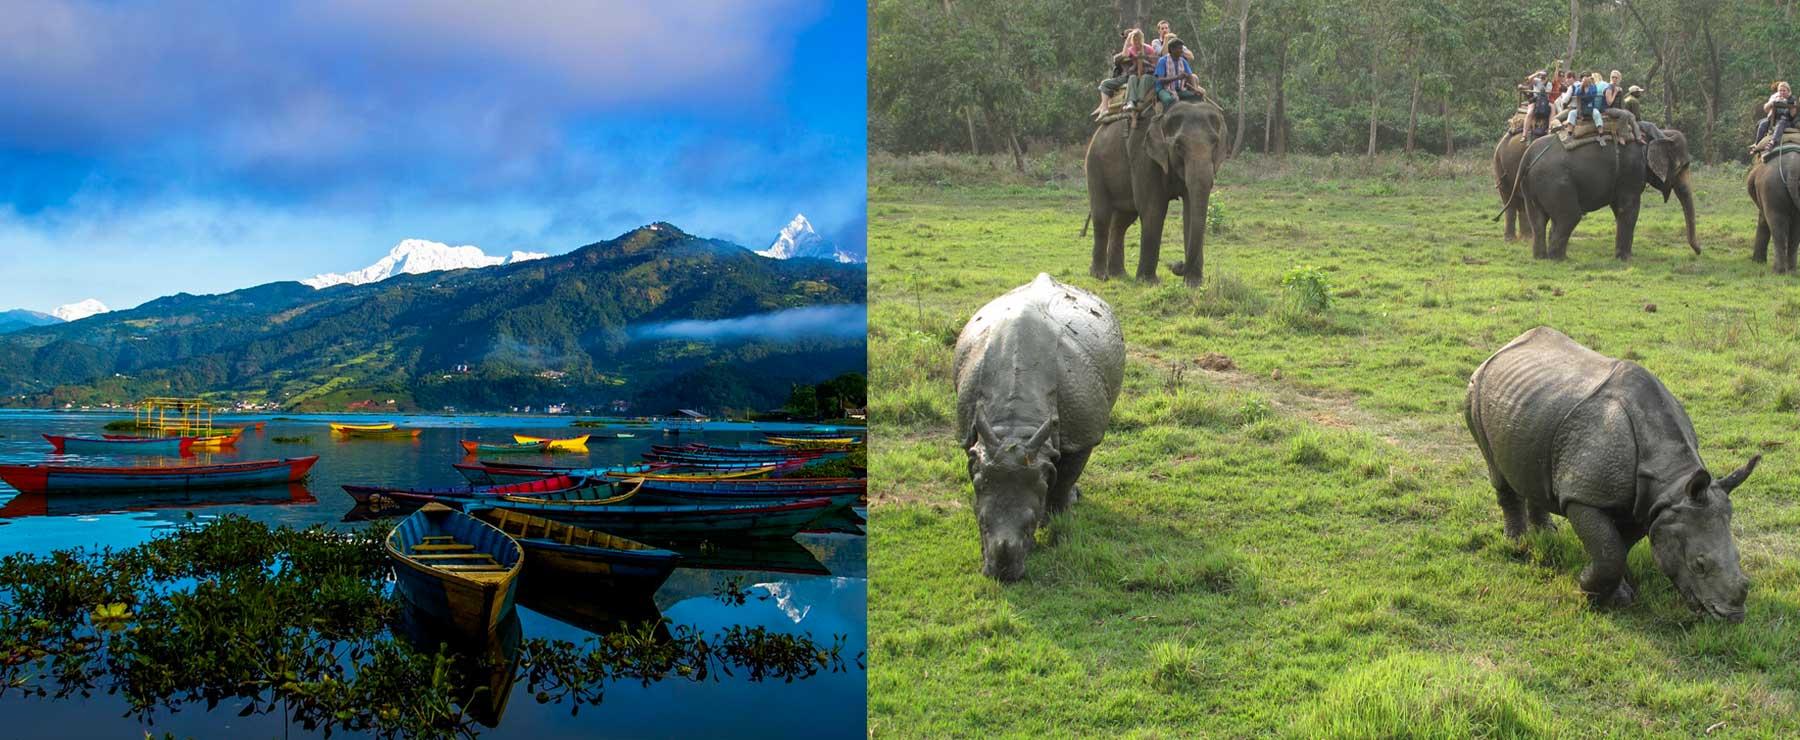 destinations-soleil-en-ete-nepal.jpg